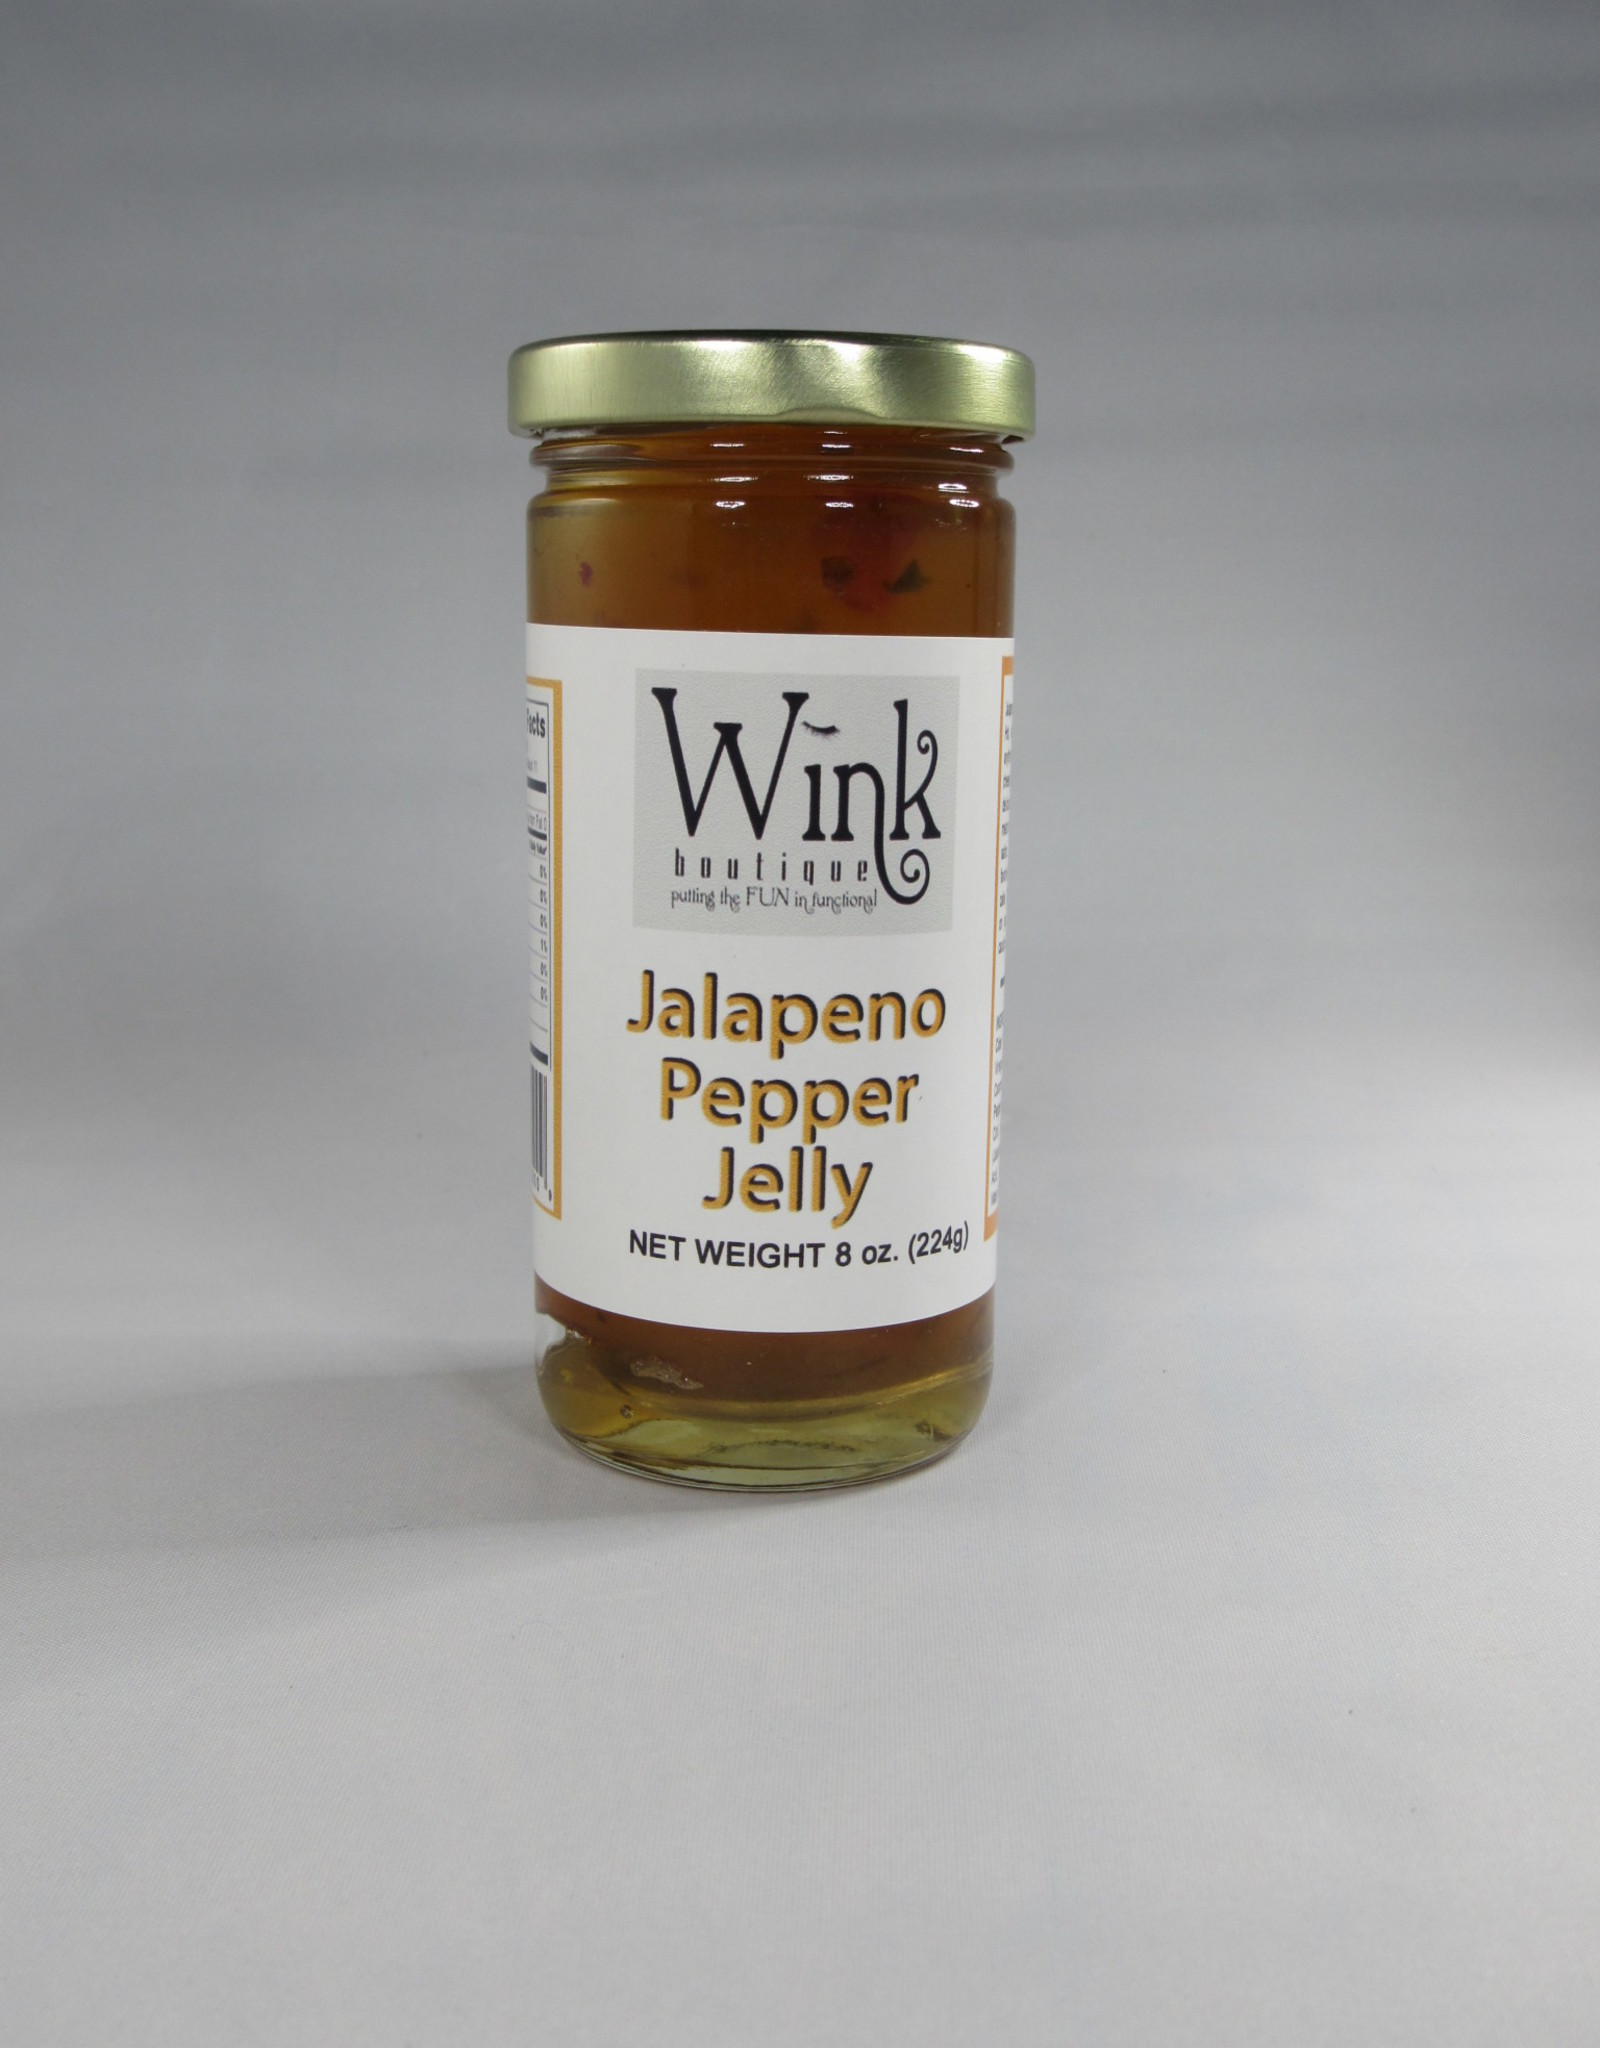 Wink Jalapeno Pepper Jelly